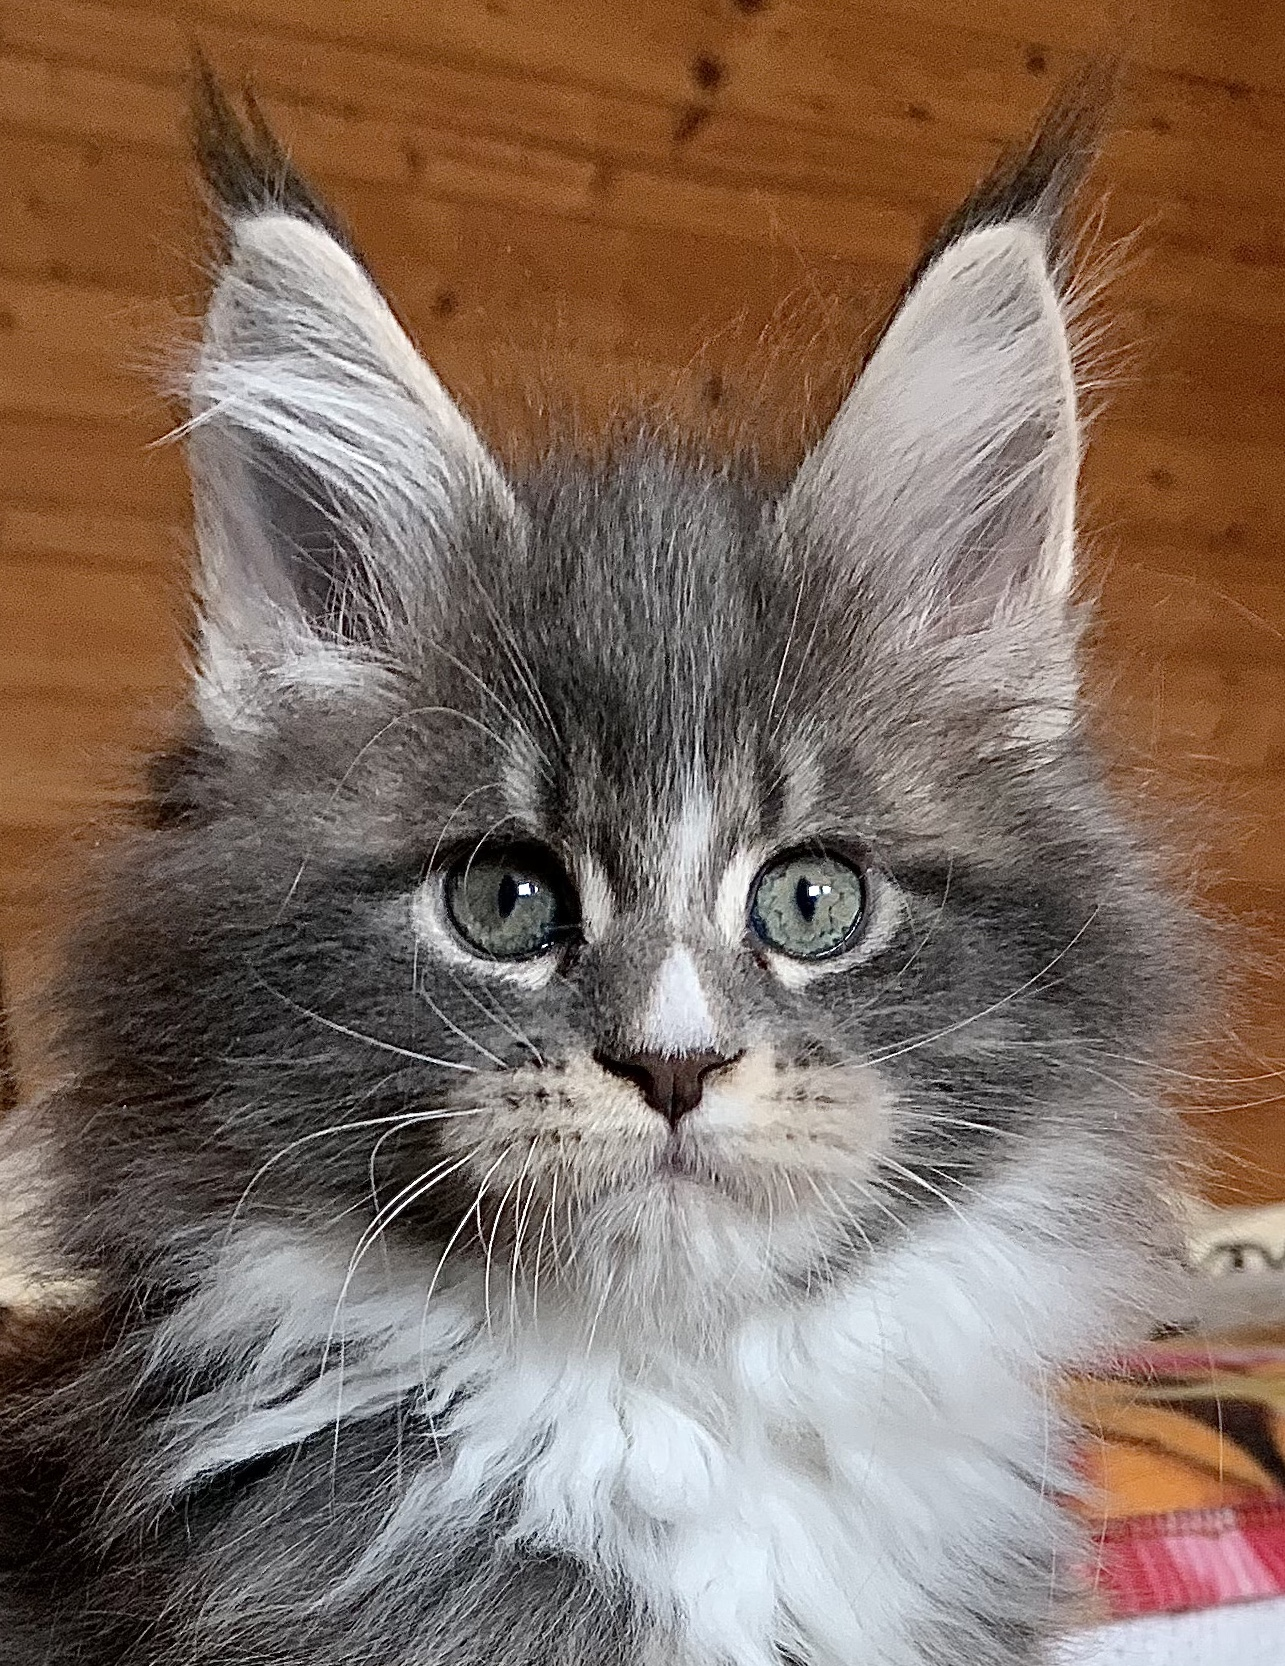 fotka kočky MEG VON ERILLIAN,CZ